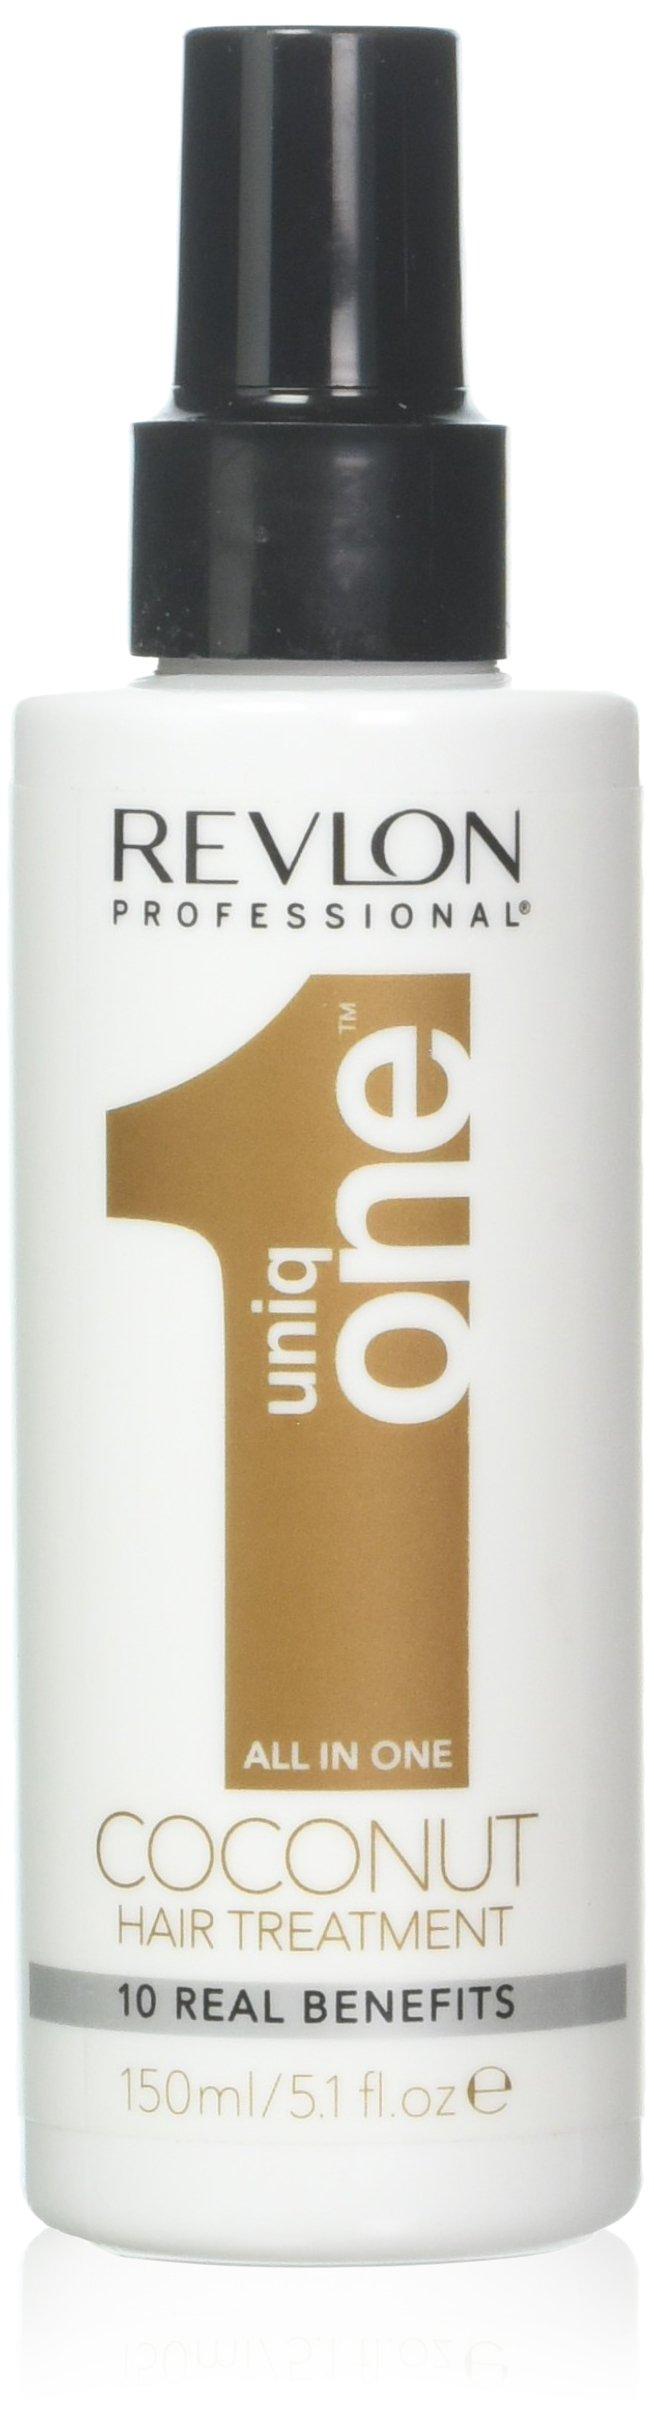 Uniq One All in One Hair Treatment Coconut - 150ml